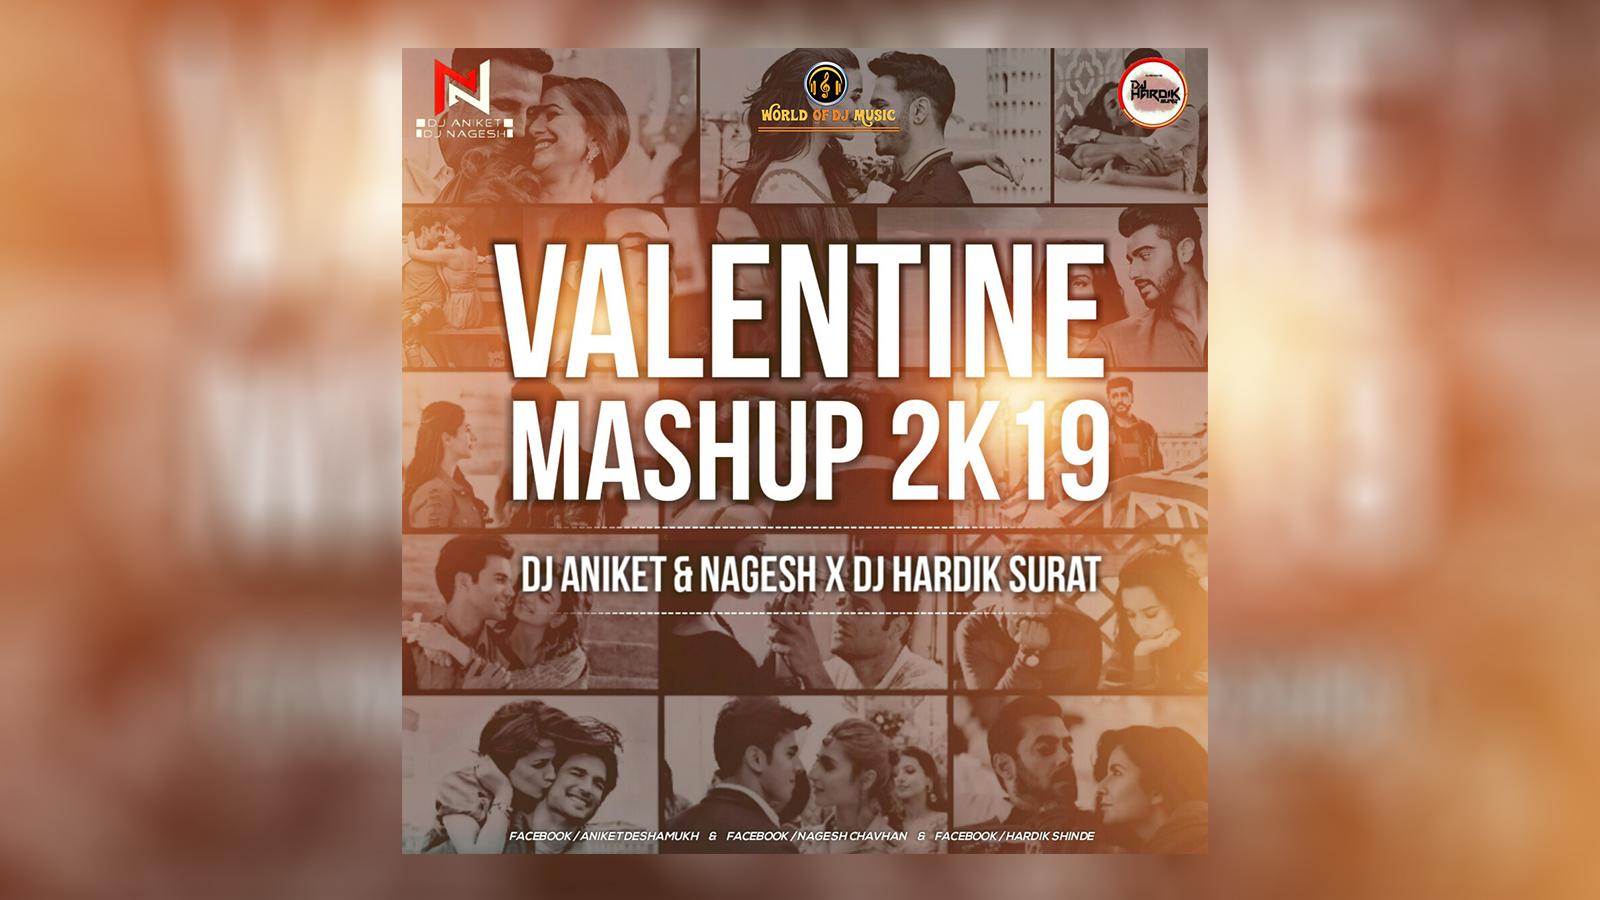 Valentine Mashup 2k19 Dj Aniket & Nagesh x Dj Hardik Surat